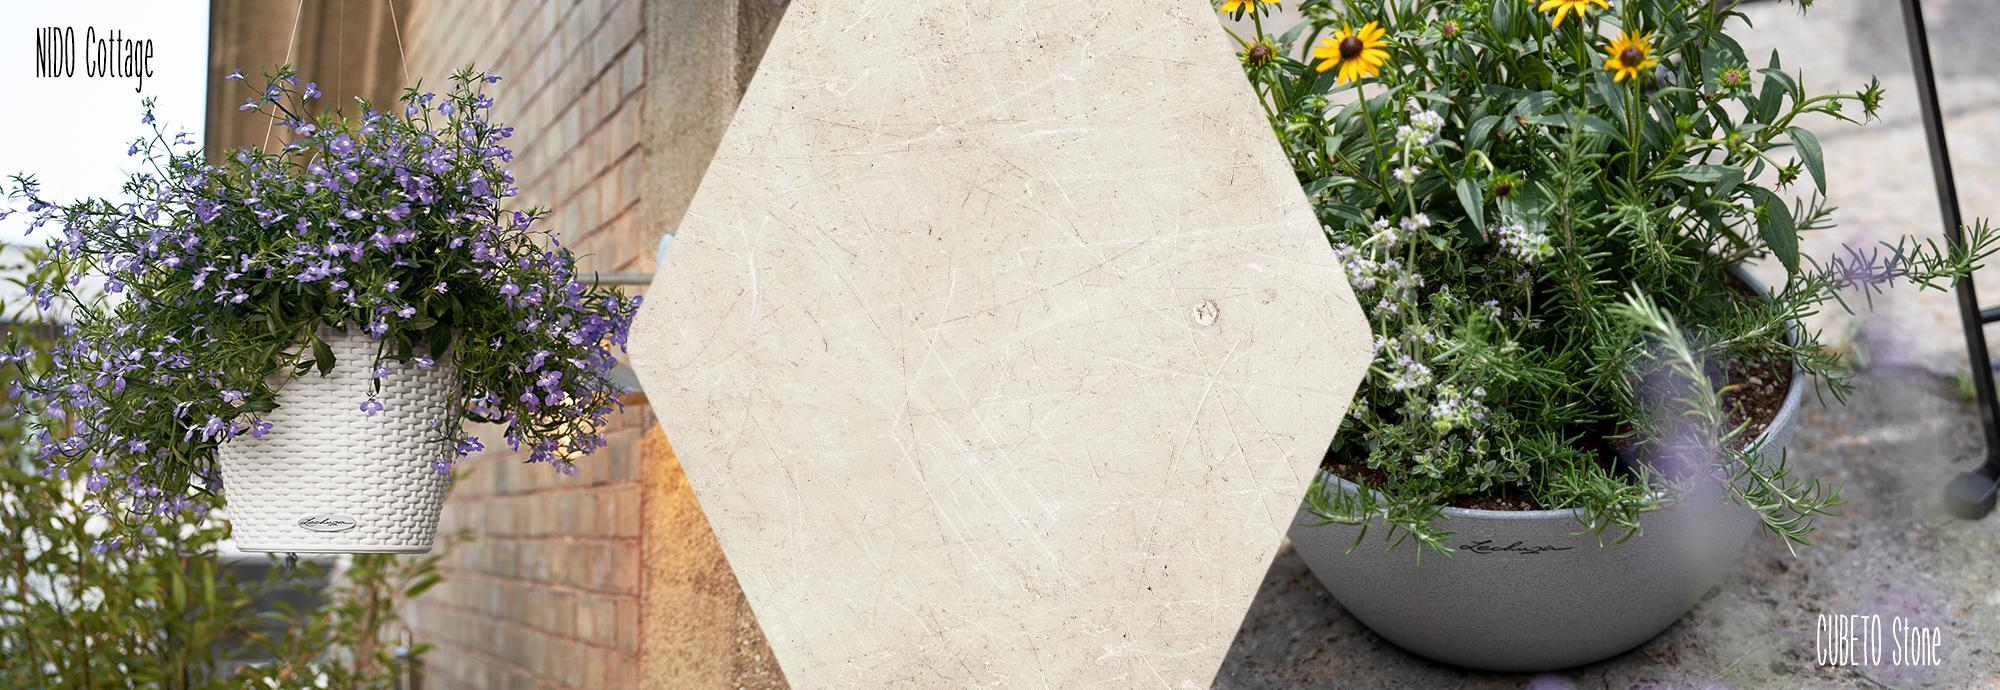 до 15% выгоды на серию CUBETO Stone и NIDO Cottage